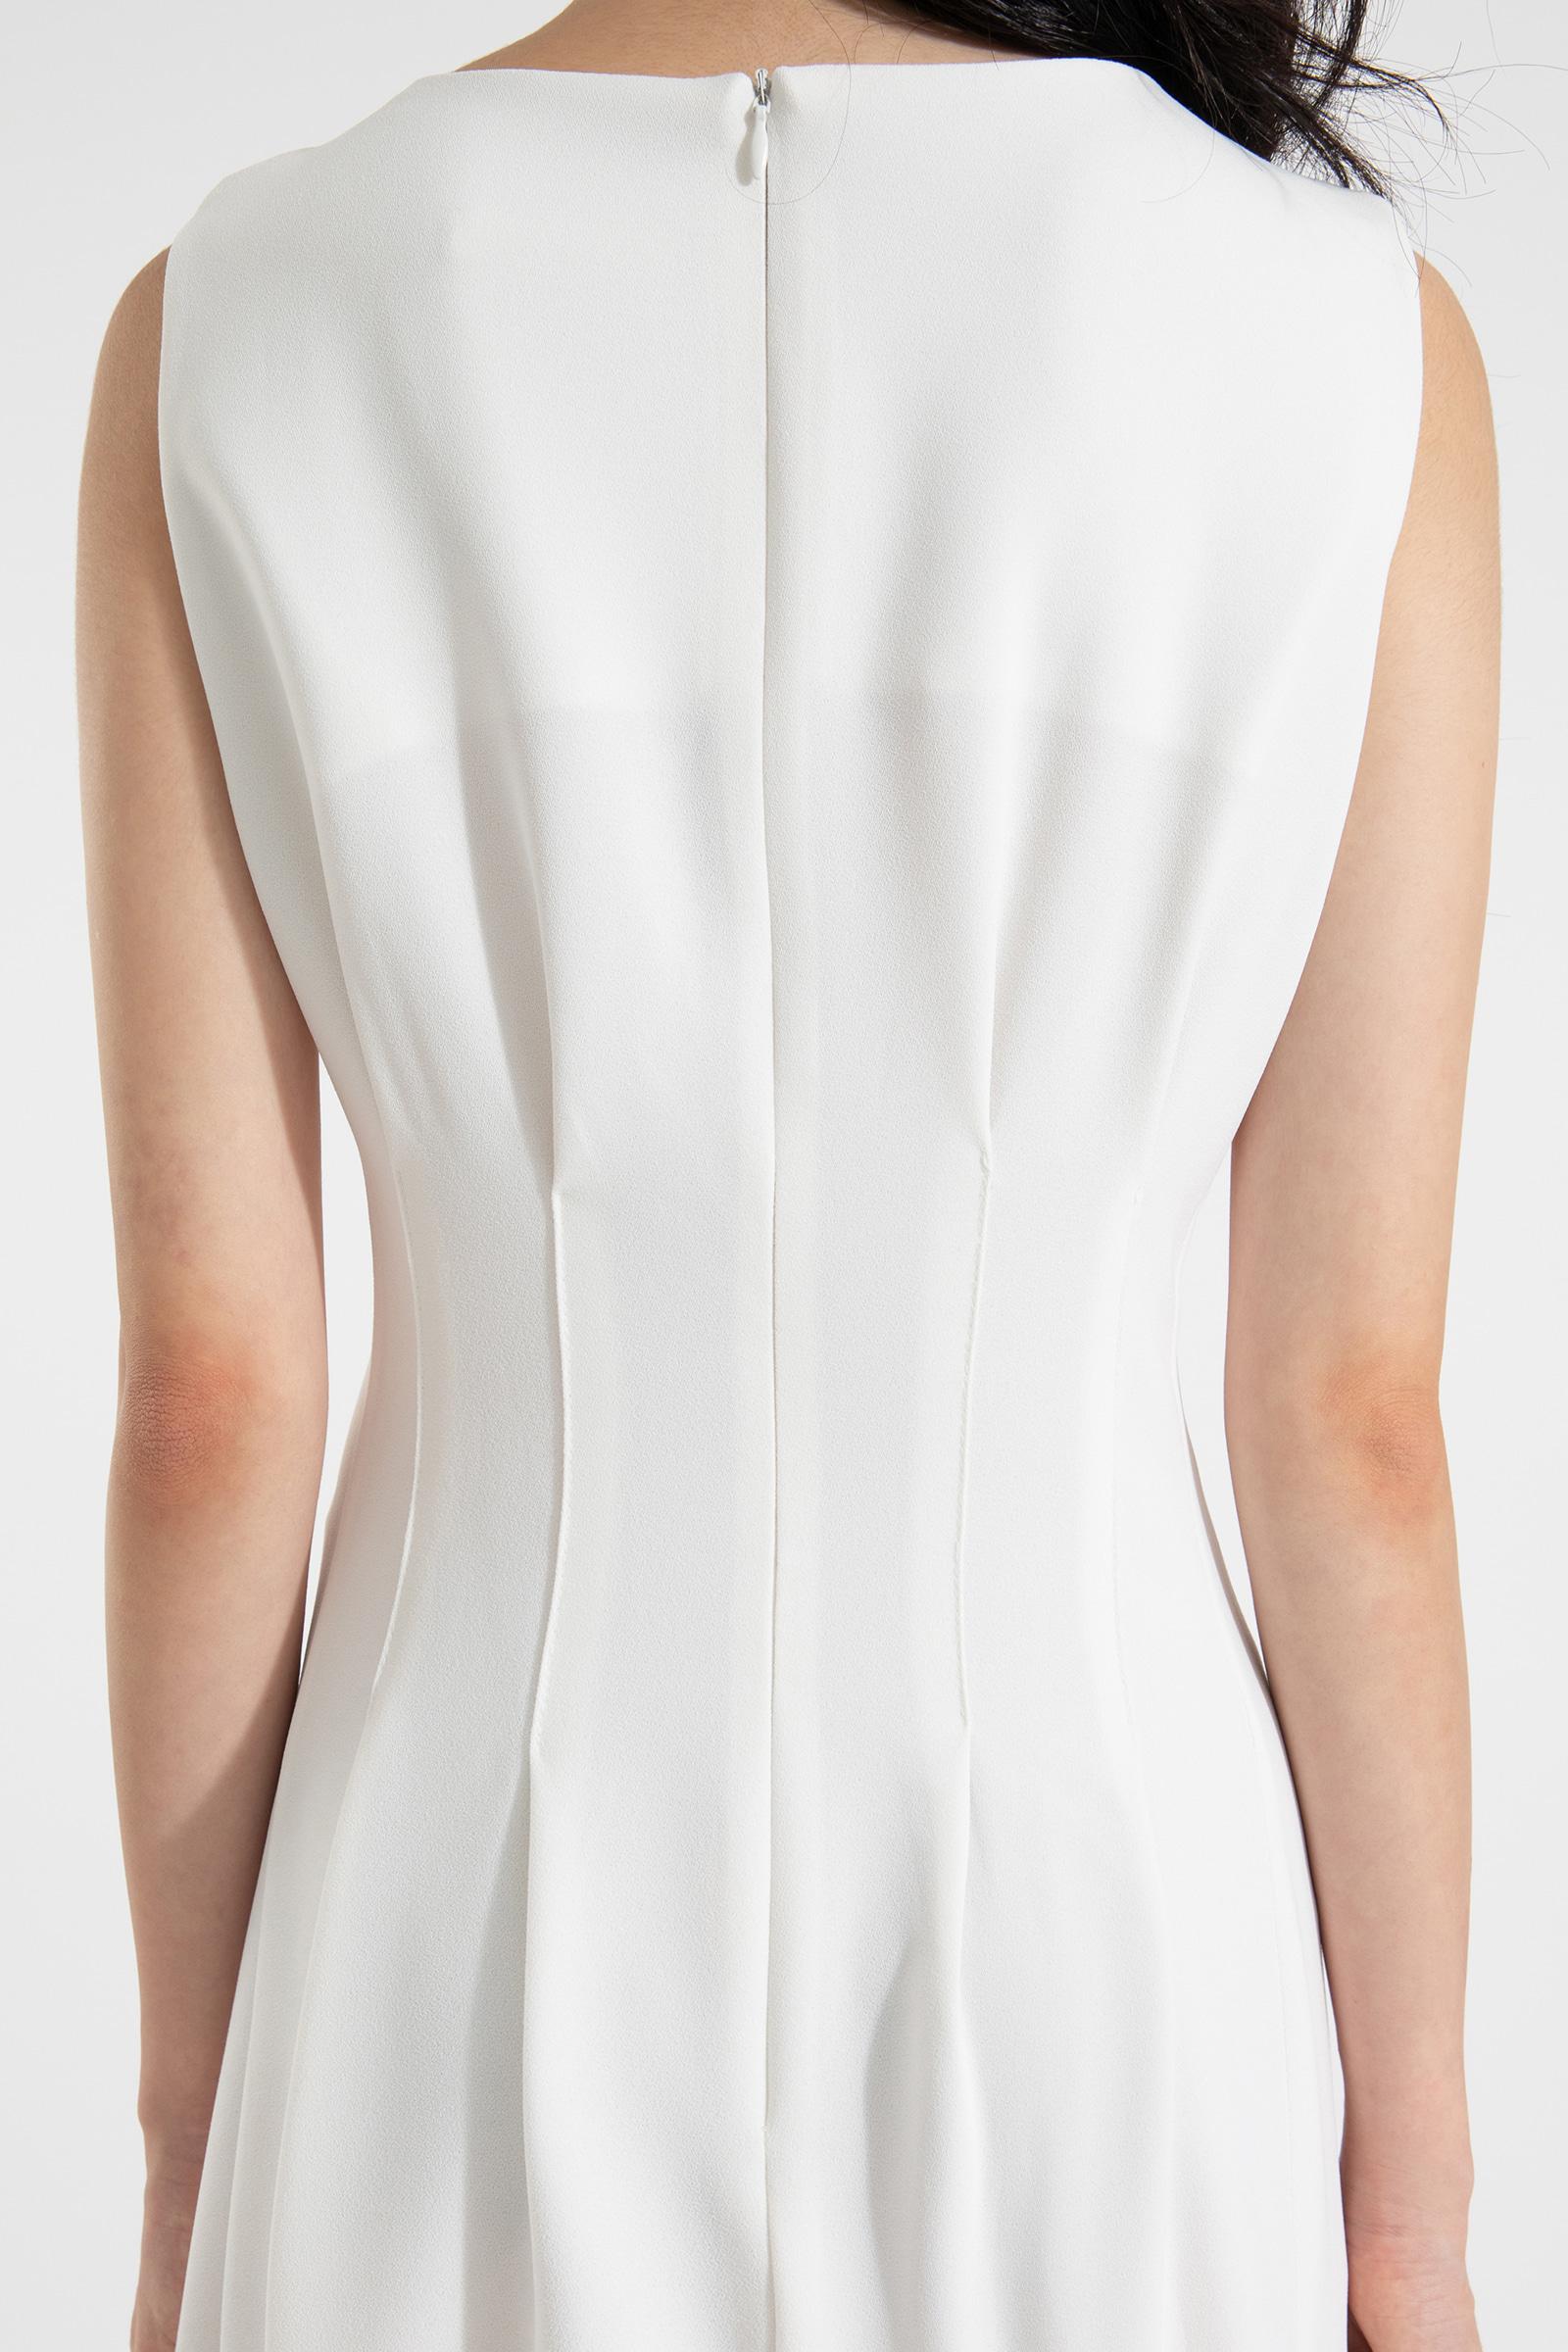 Cassia pintuck line midi dress